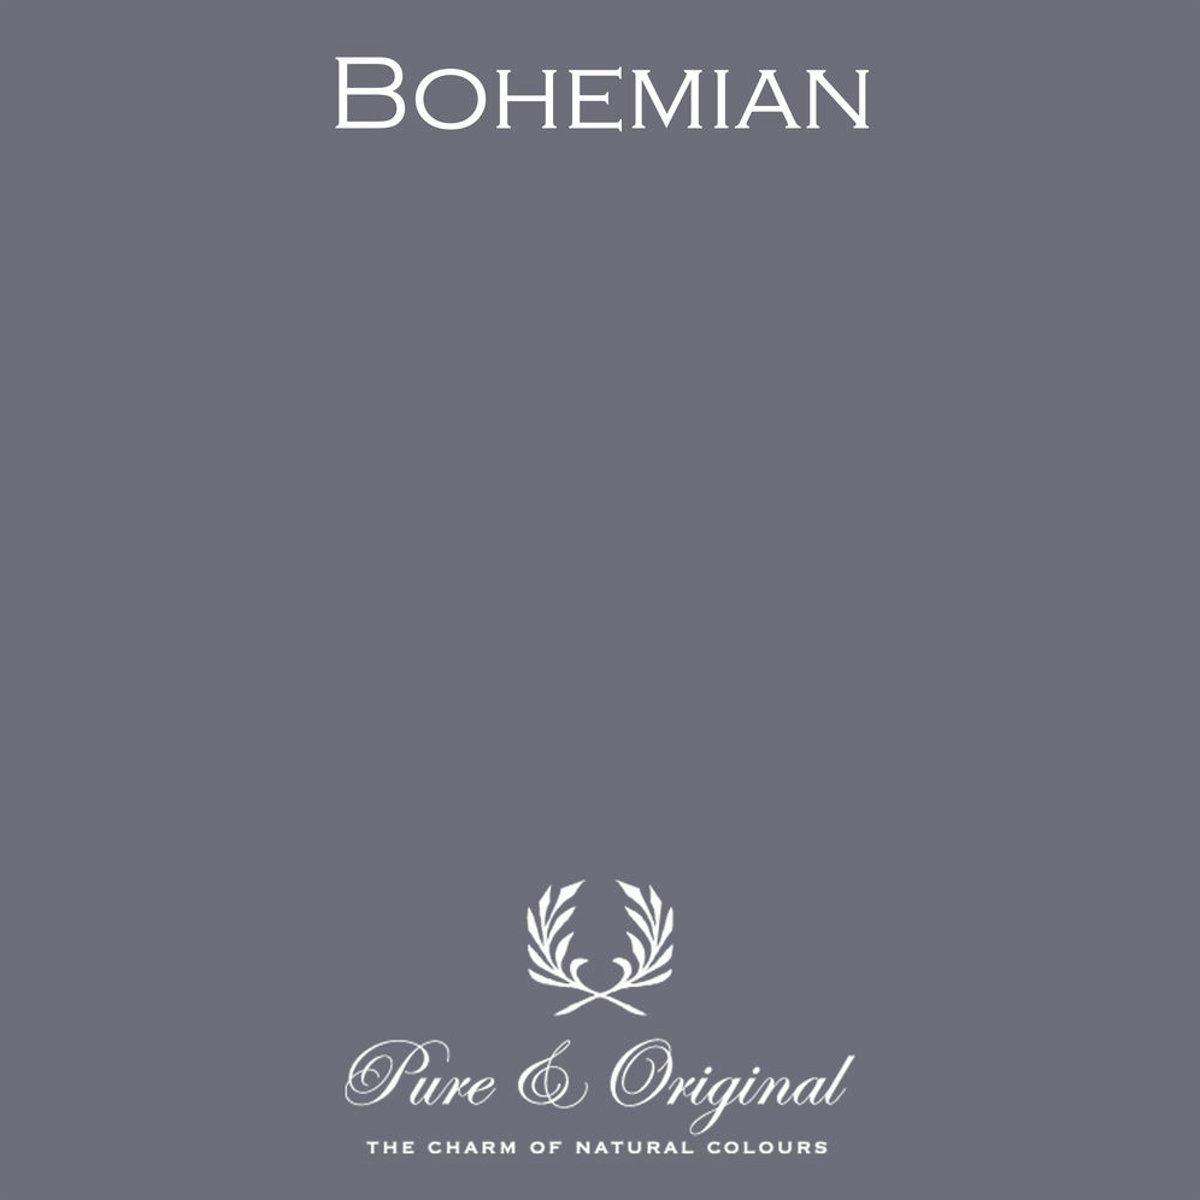 Pure & Original Classico Regular Bohemian 0.25L